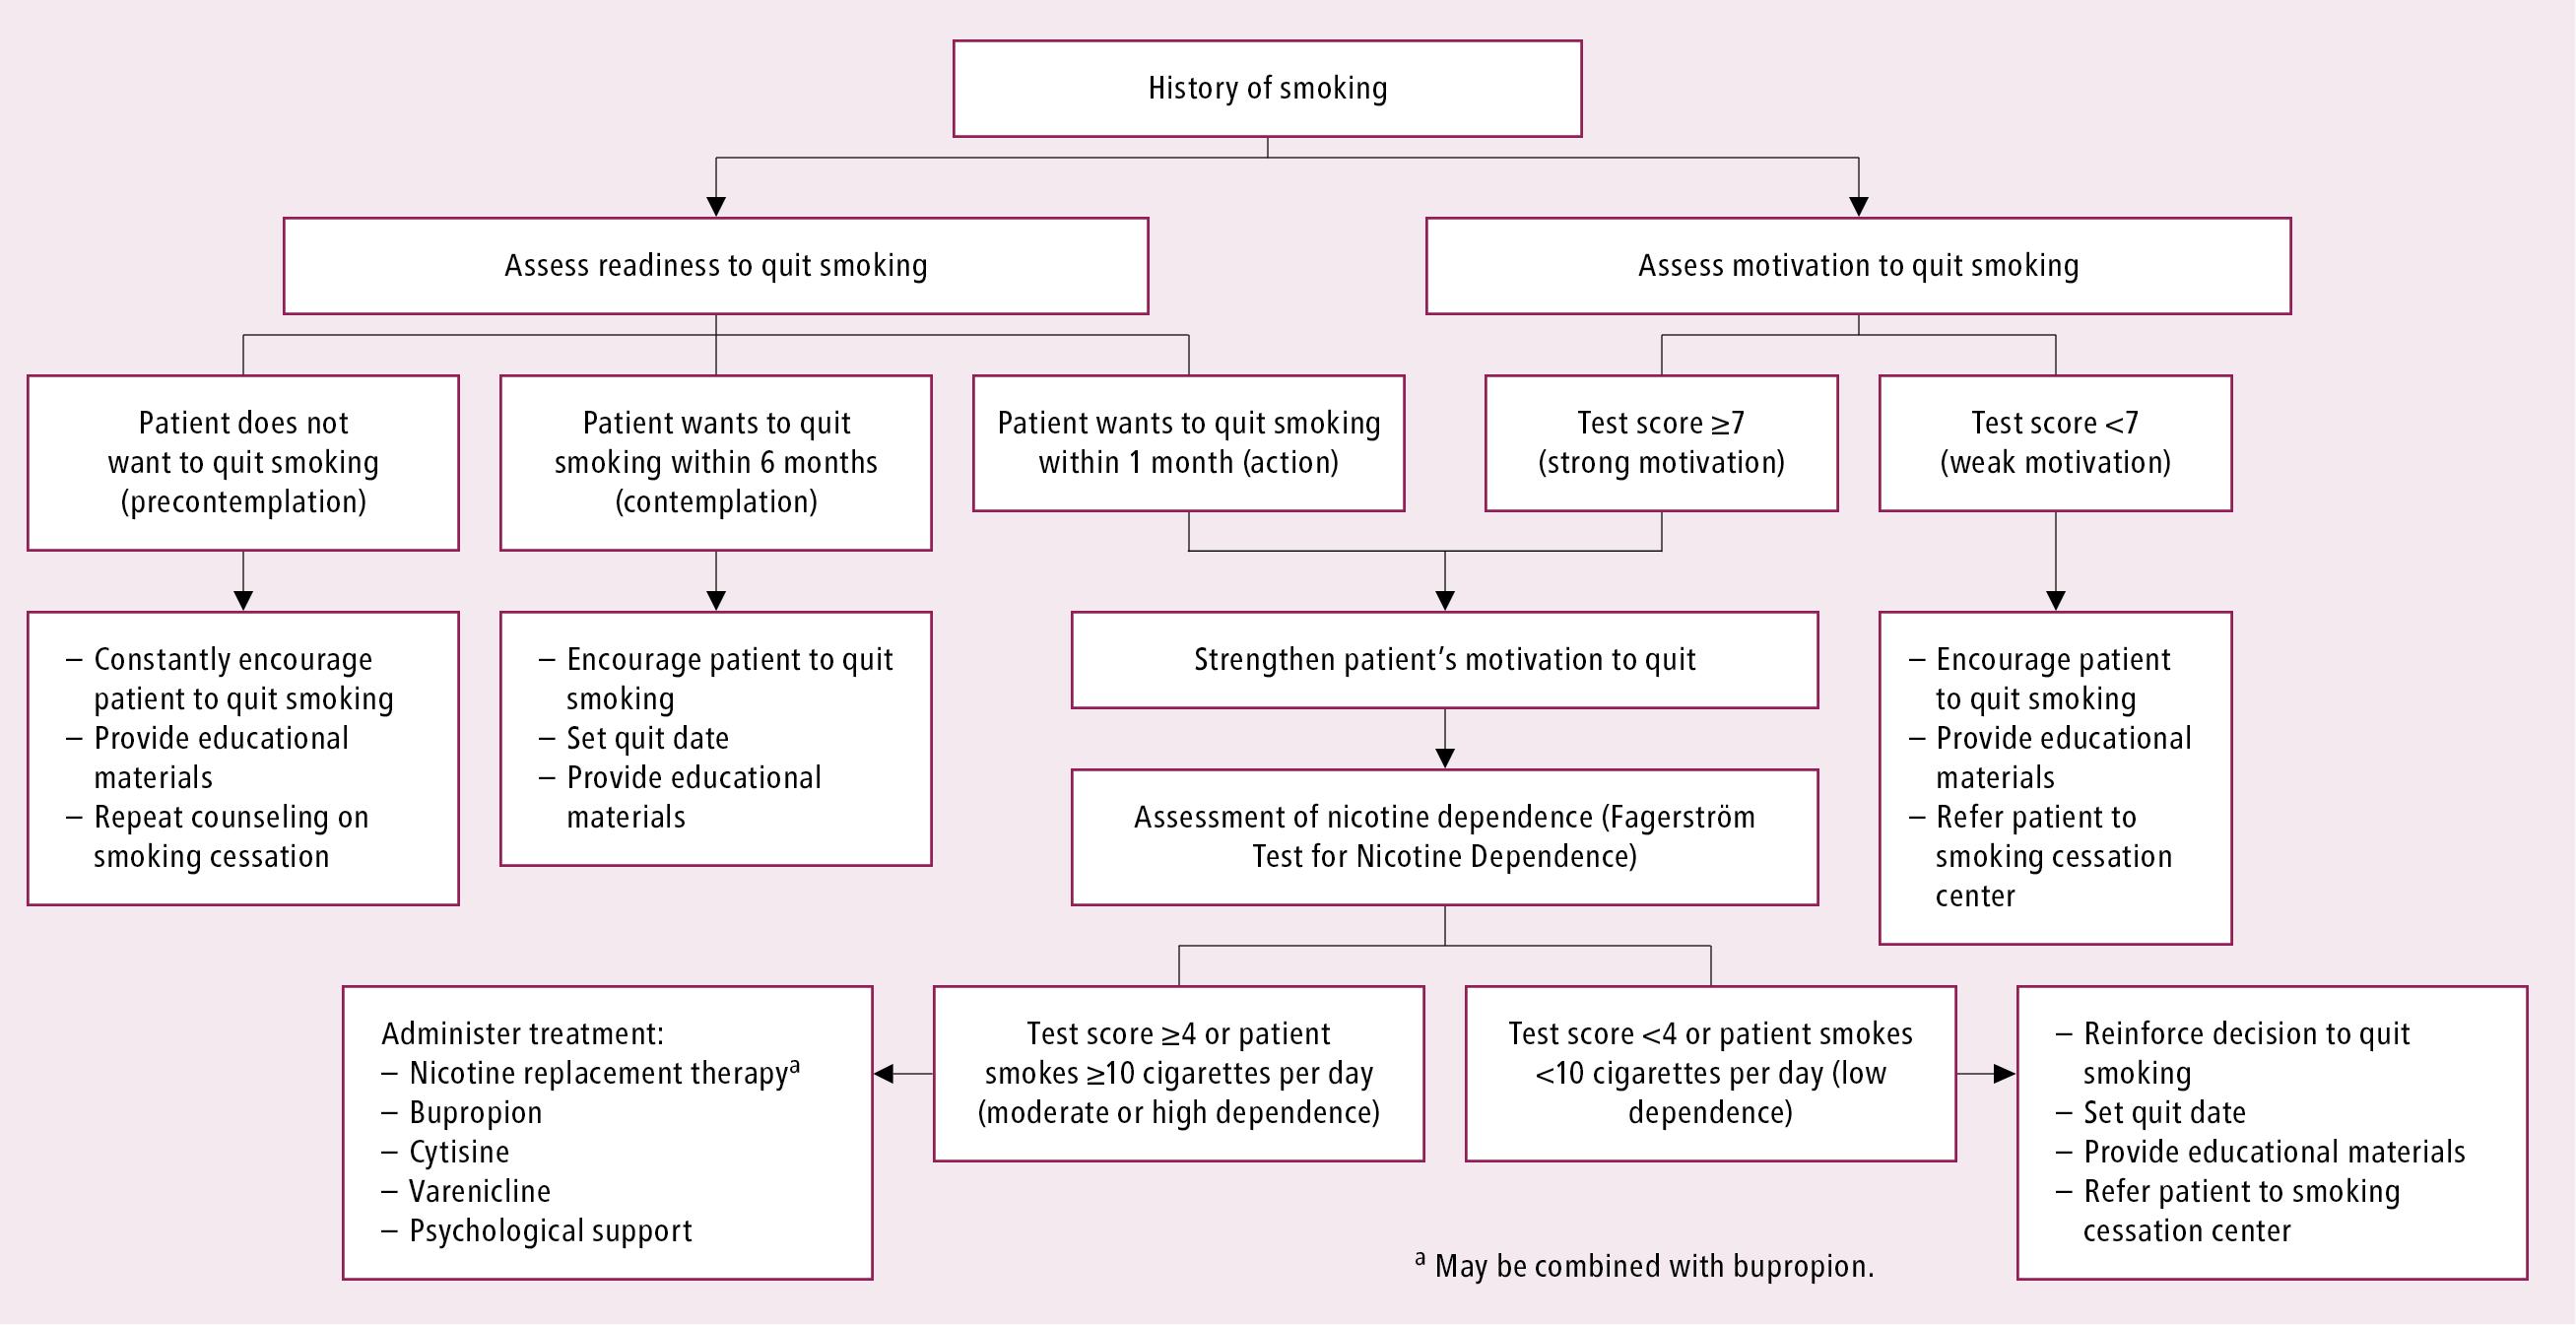 Figure 031_1_0733.  Smoking cessation algorithm.